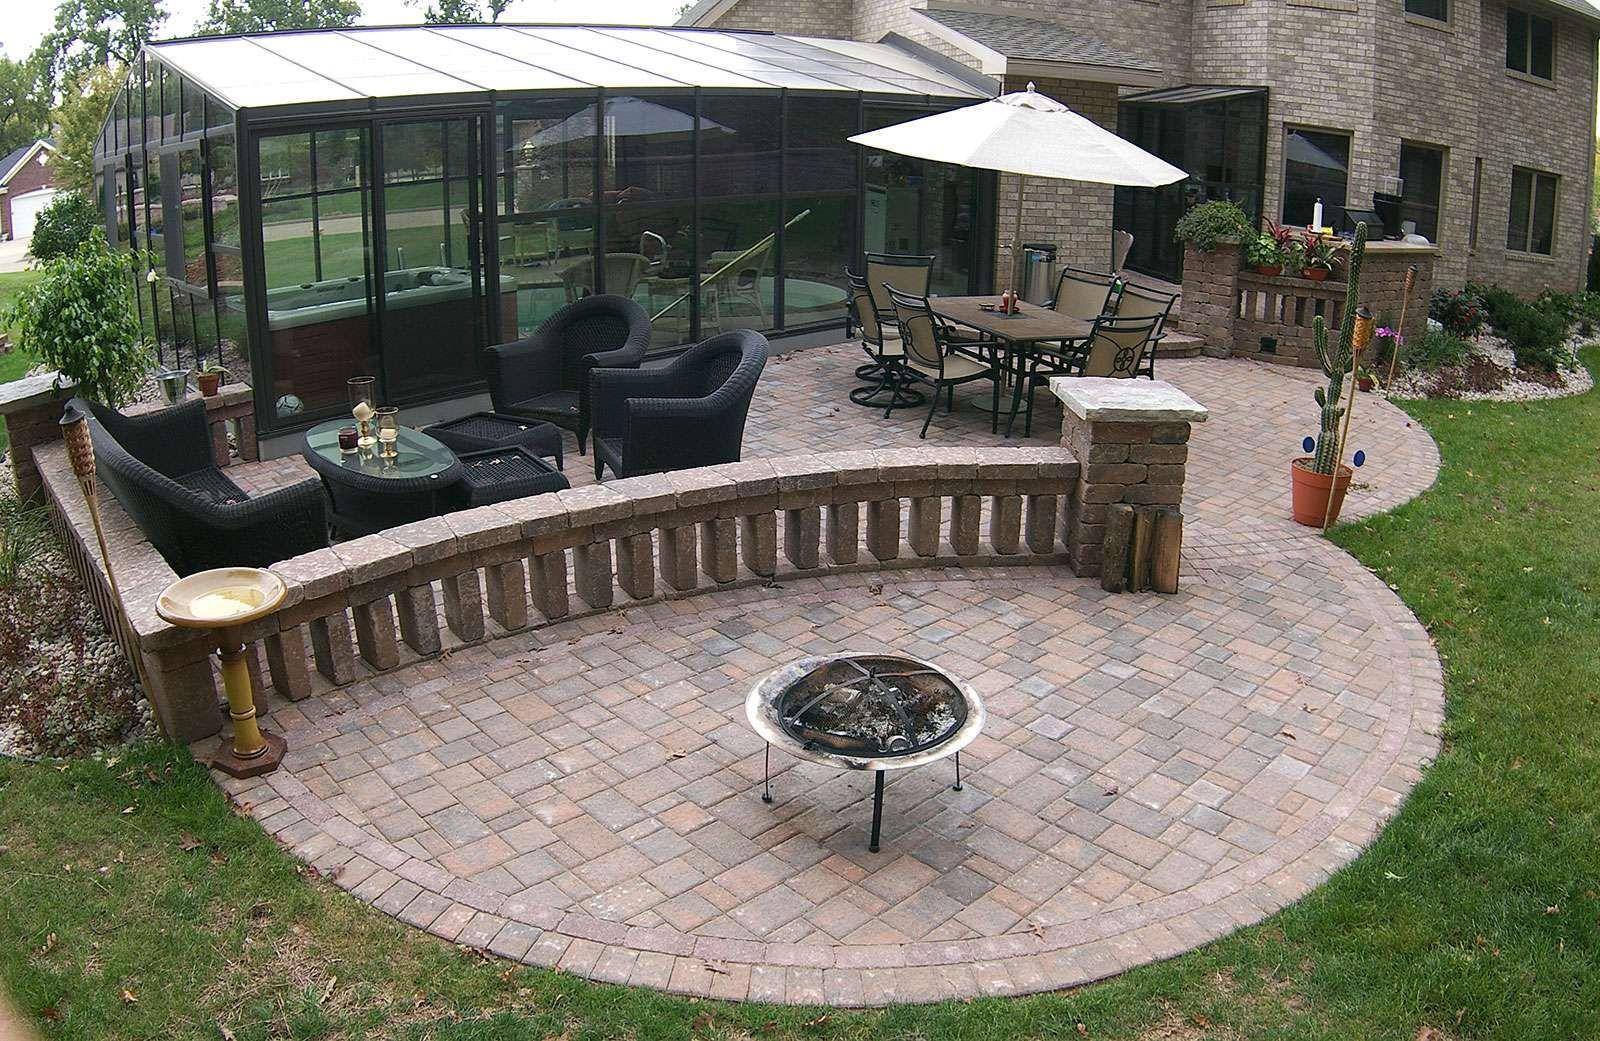 Seat Walls Hardscape patio, Wall seating, Hardscape